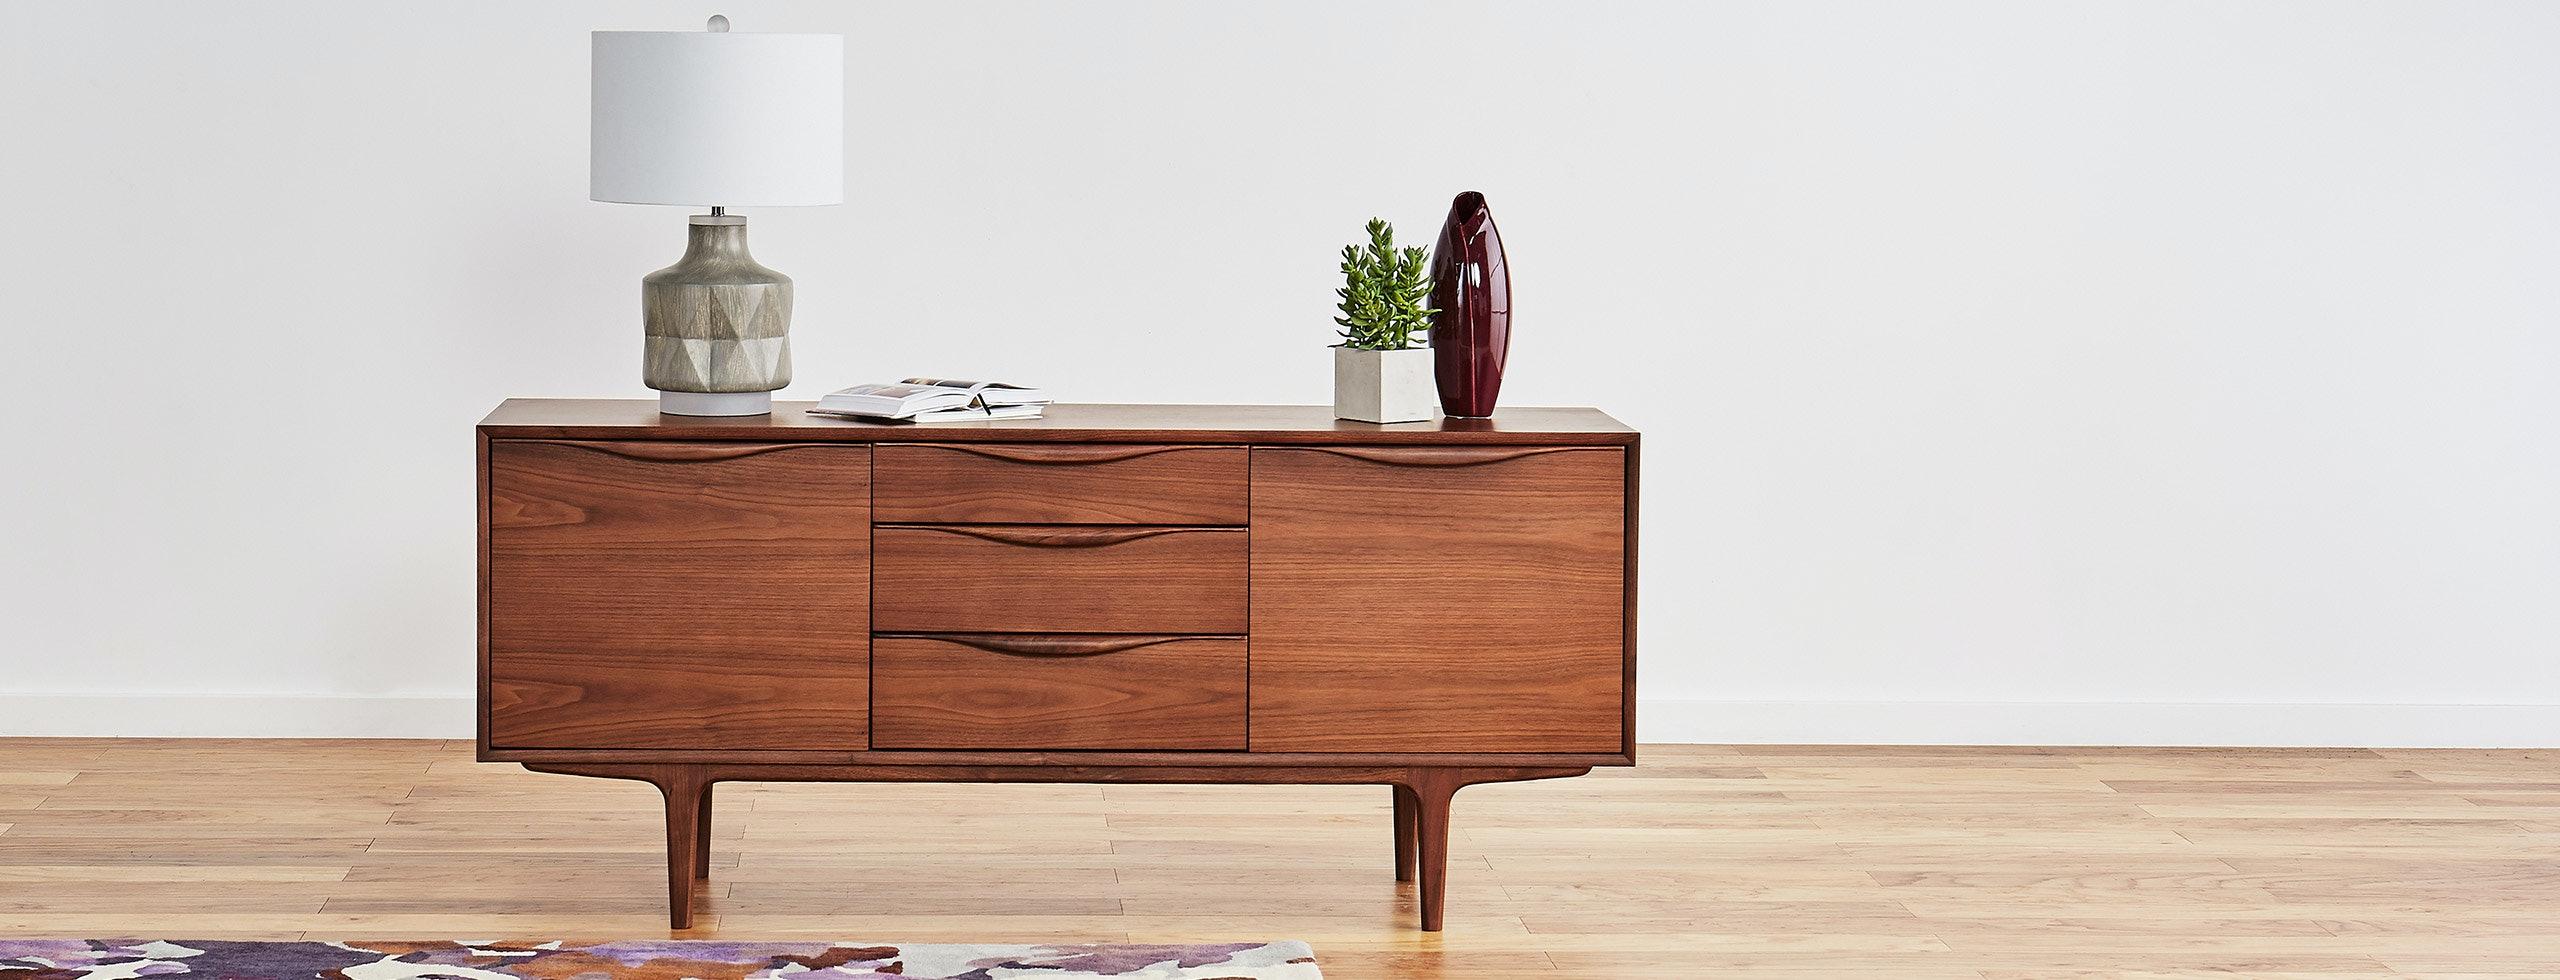 Mckenzie drawer console walnut lastudio hero